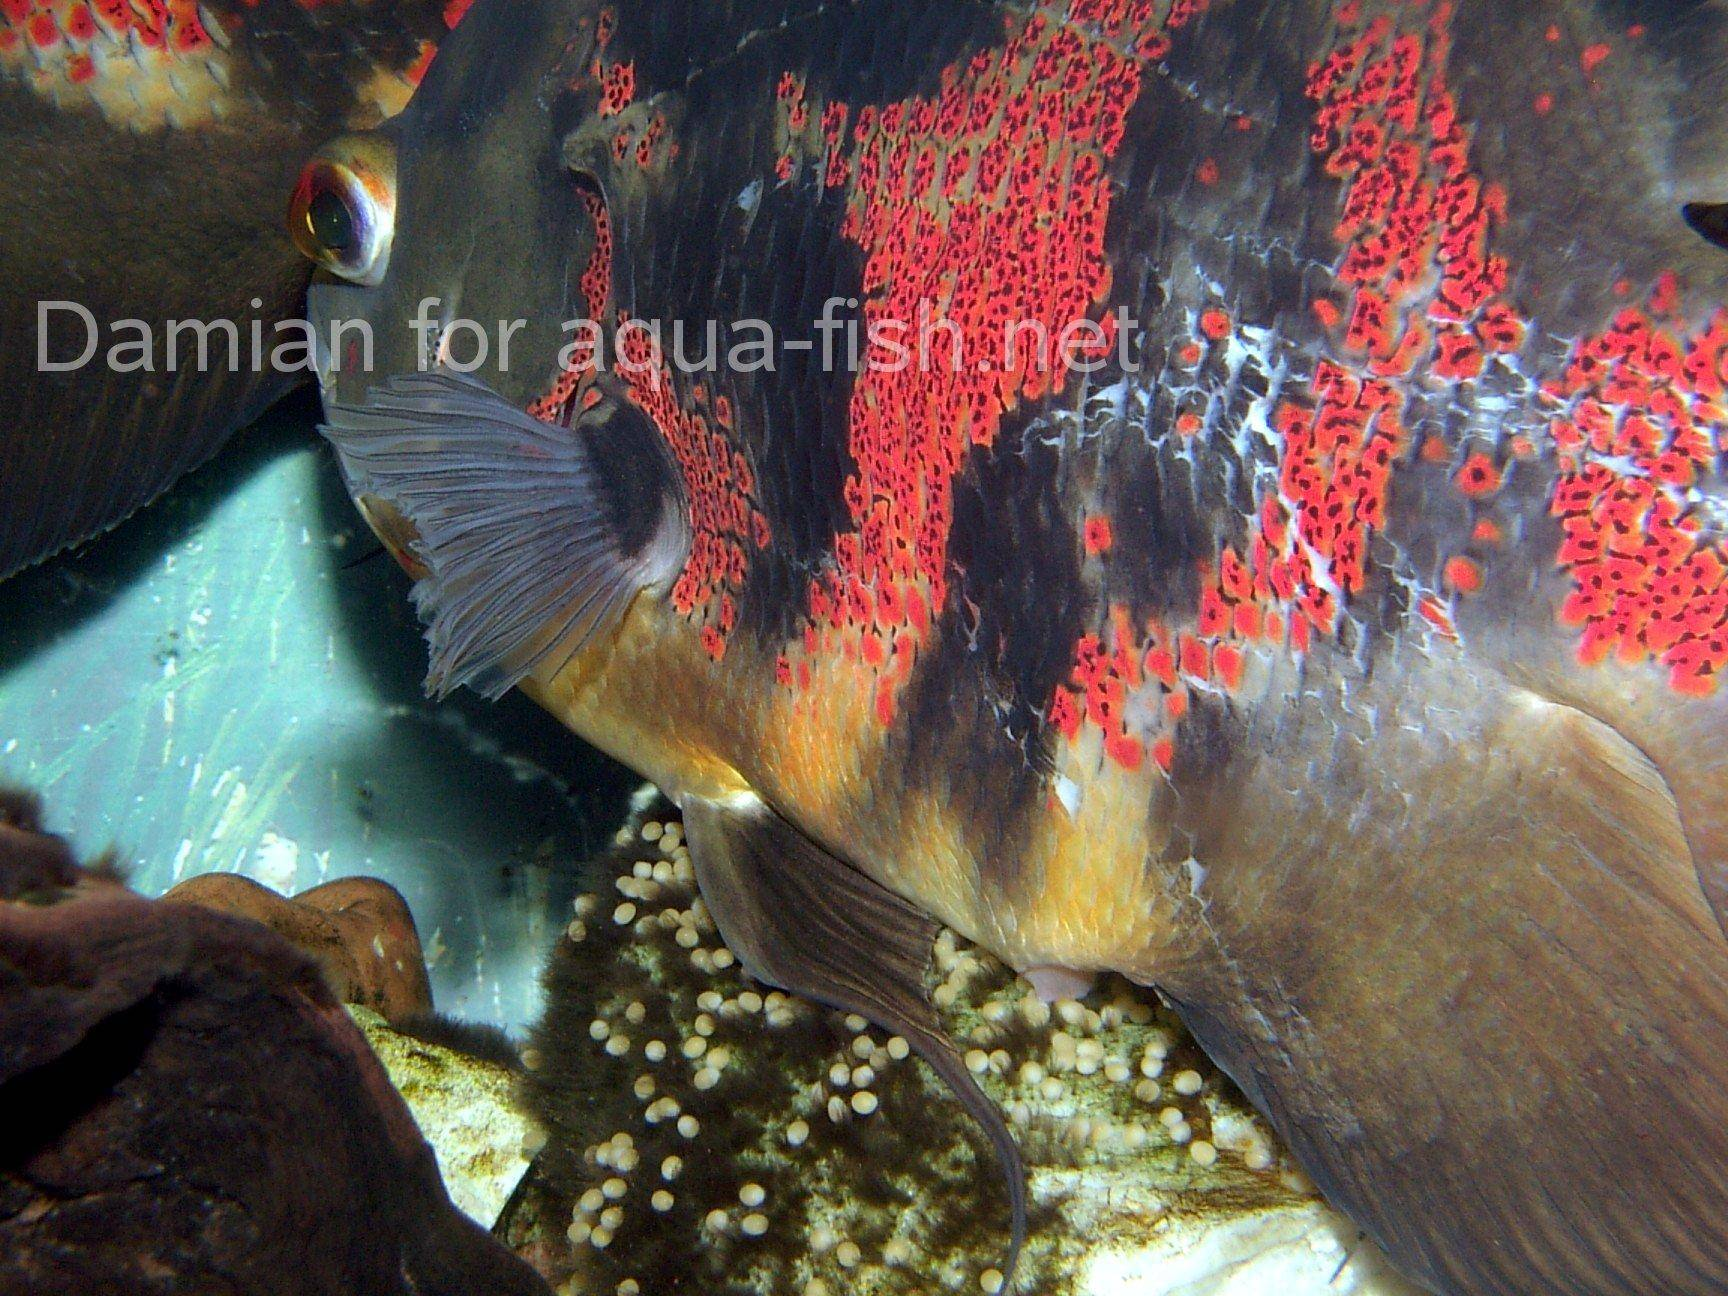 21248 Albino Sucker Fish likewise 302374562452896205 moreover YmljaGlyIGVlbA additionally Burmese pythons in florida additionally Guide Raising Breeding Oscar Fish. on oscar fish fully grown